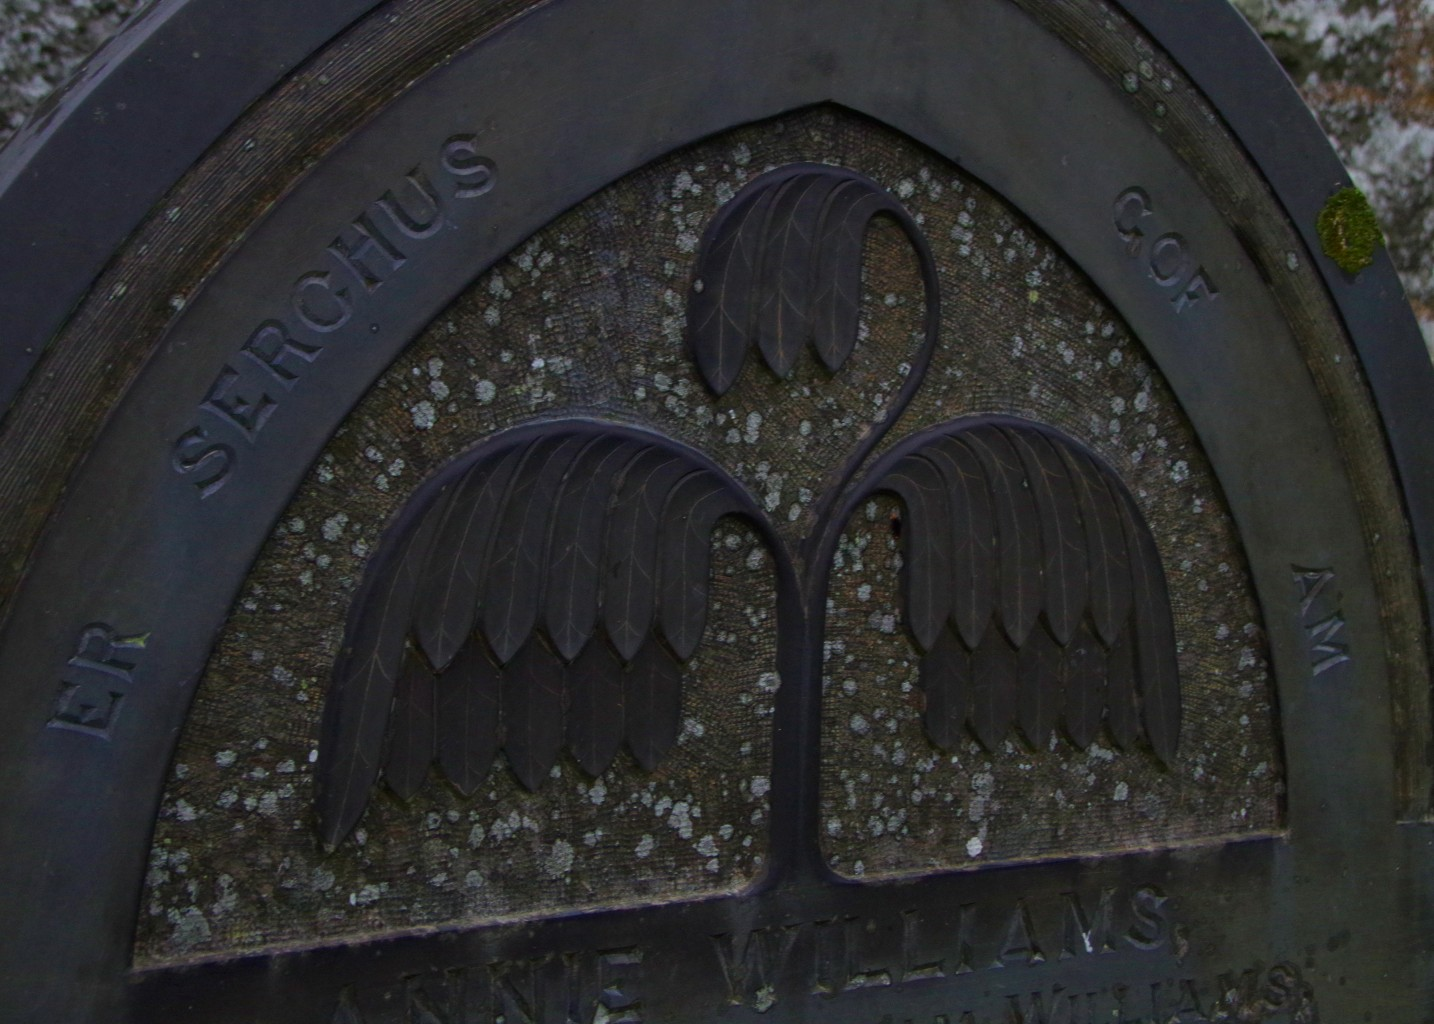 Headstone at Sant Mihangel Treflys